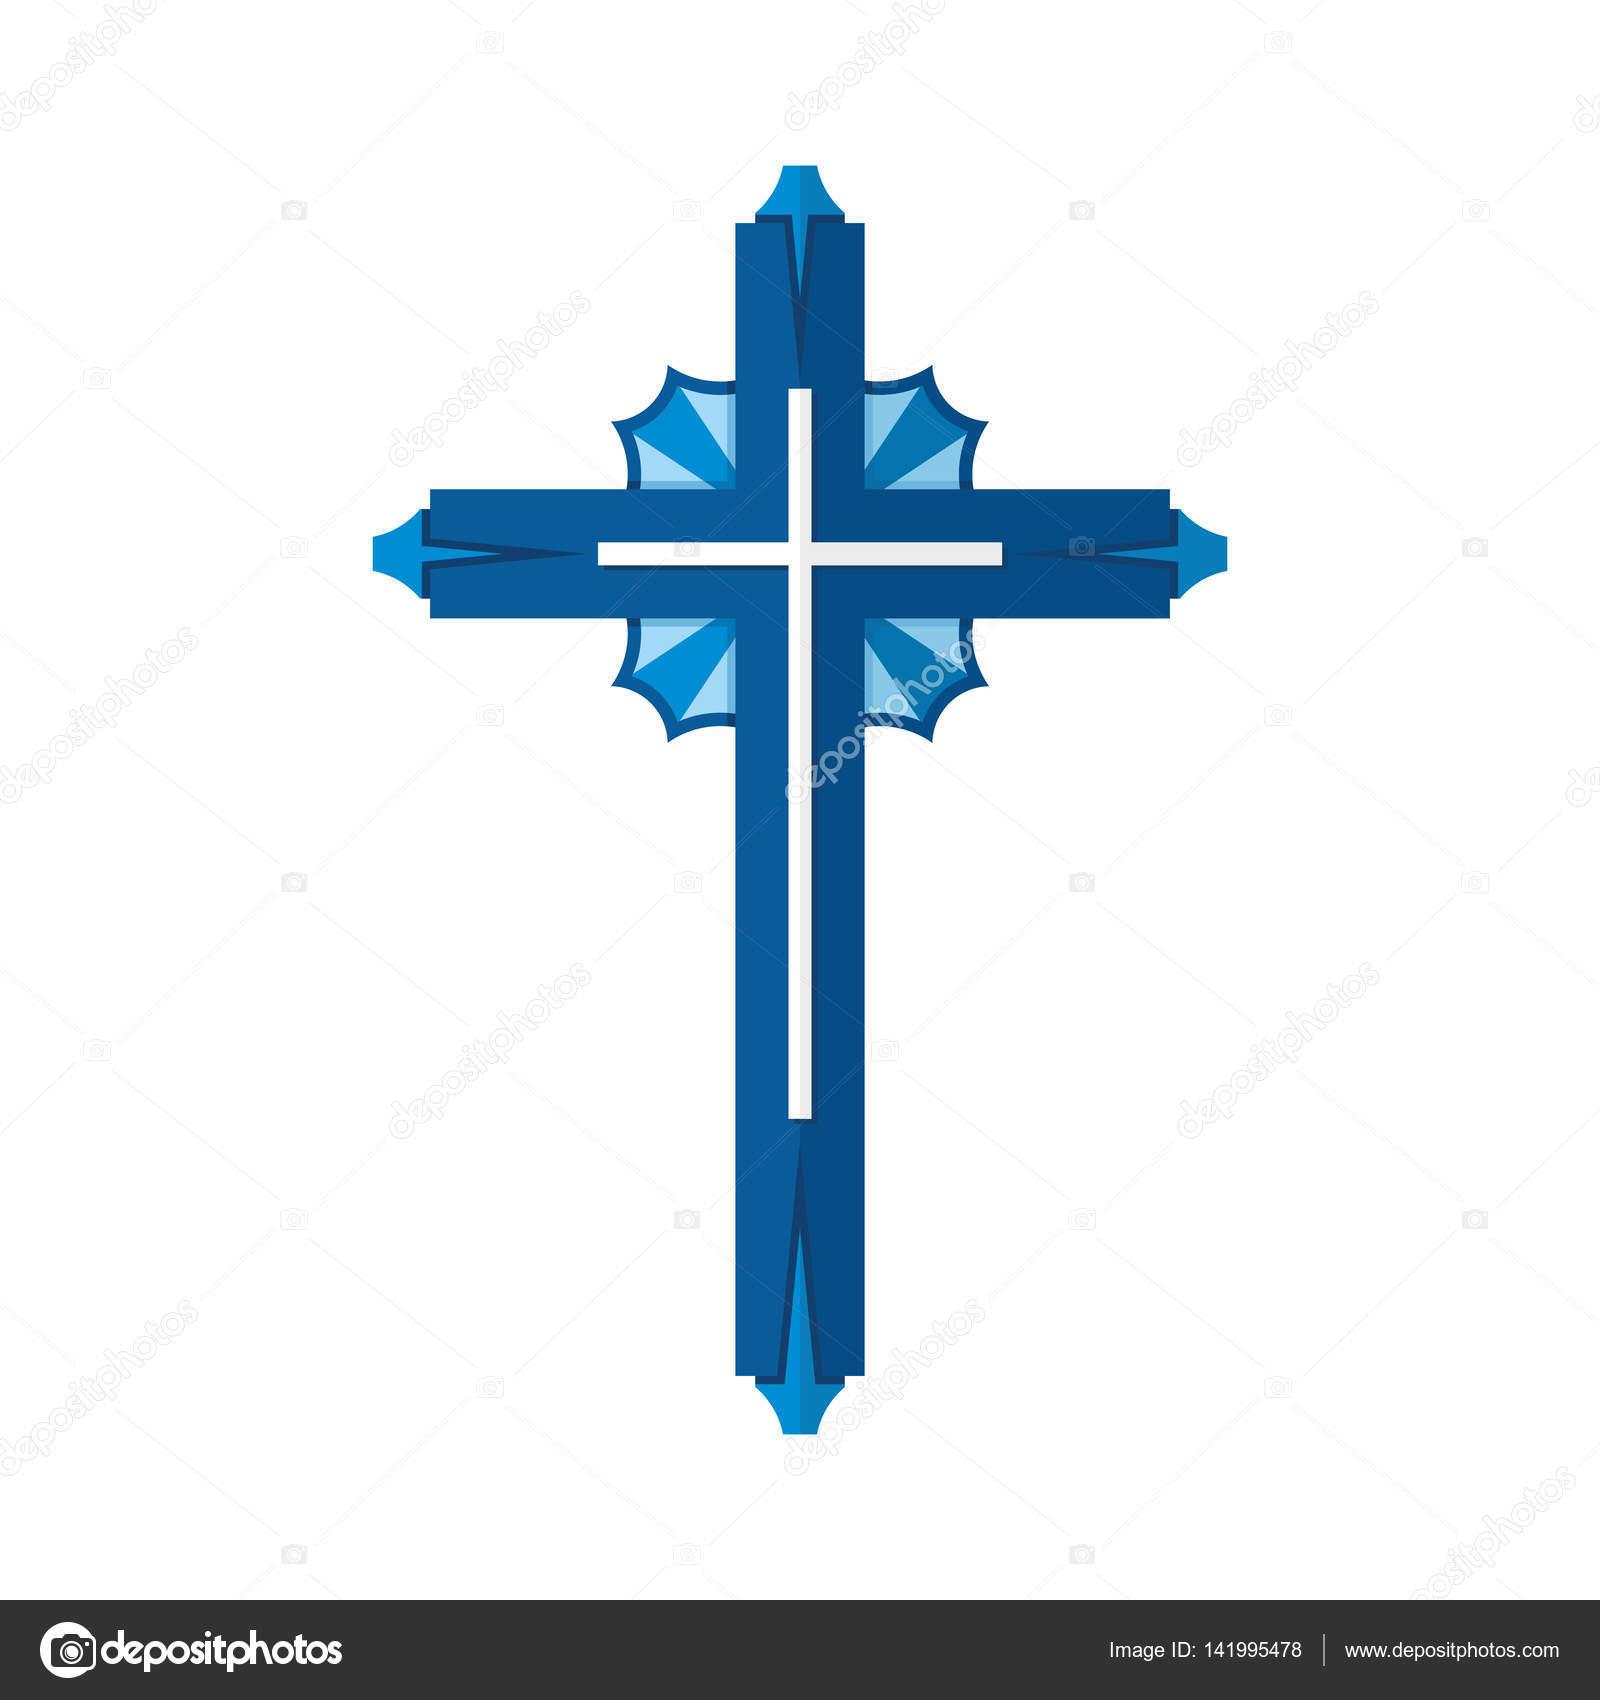 christian symbol cross of the lord and savior jesus christ